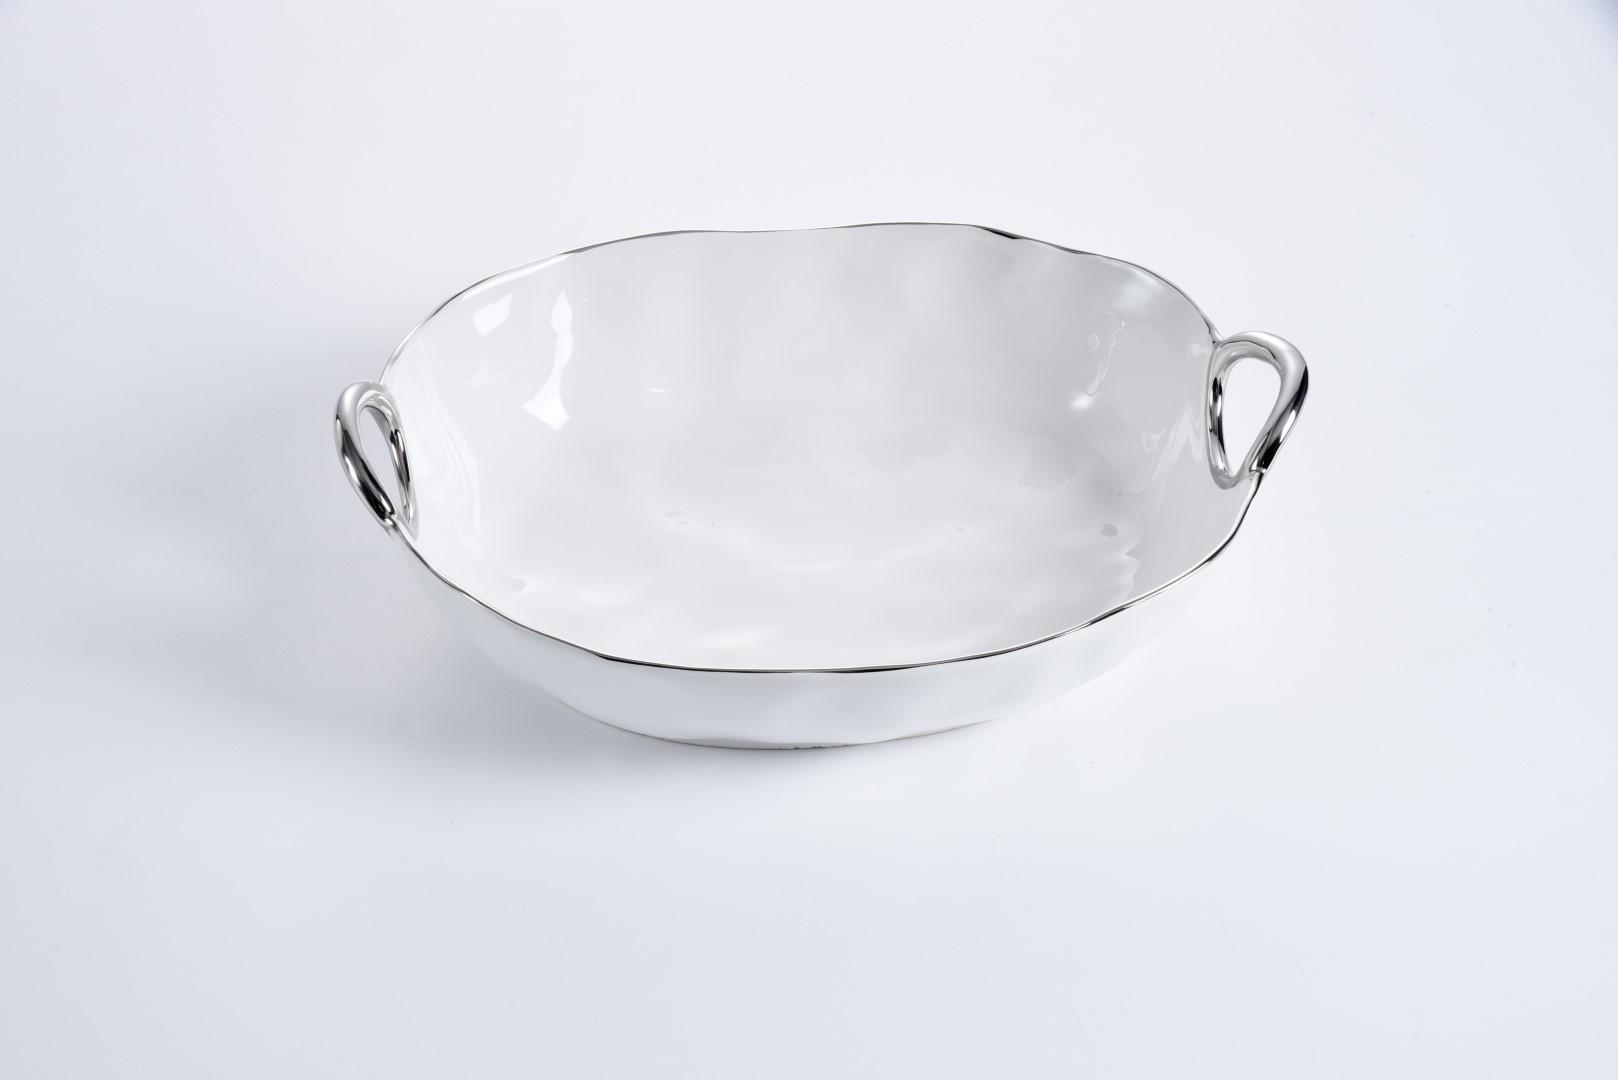 Deep Oval Baking Dish